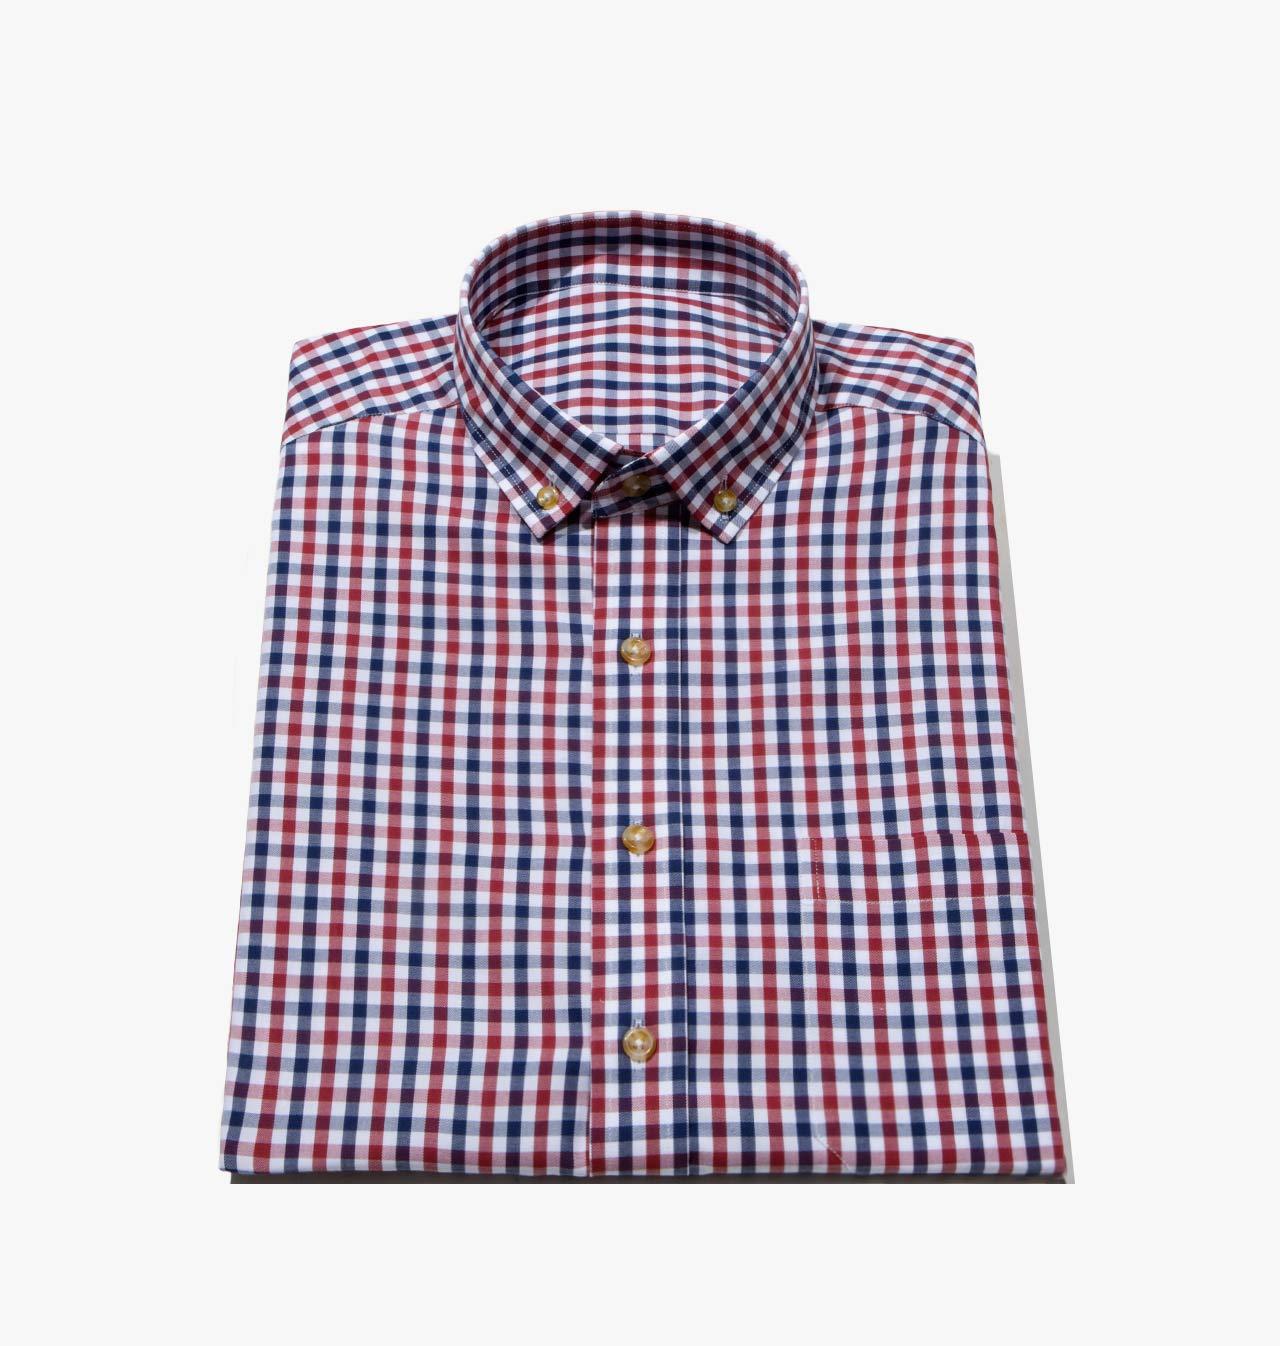 Shirt design victoria bc - Shirt Design Victoria Bc 74